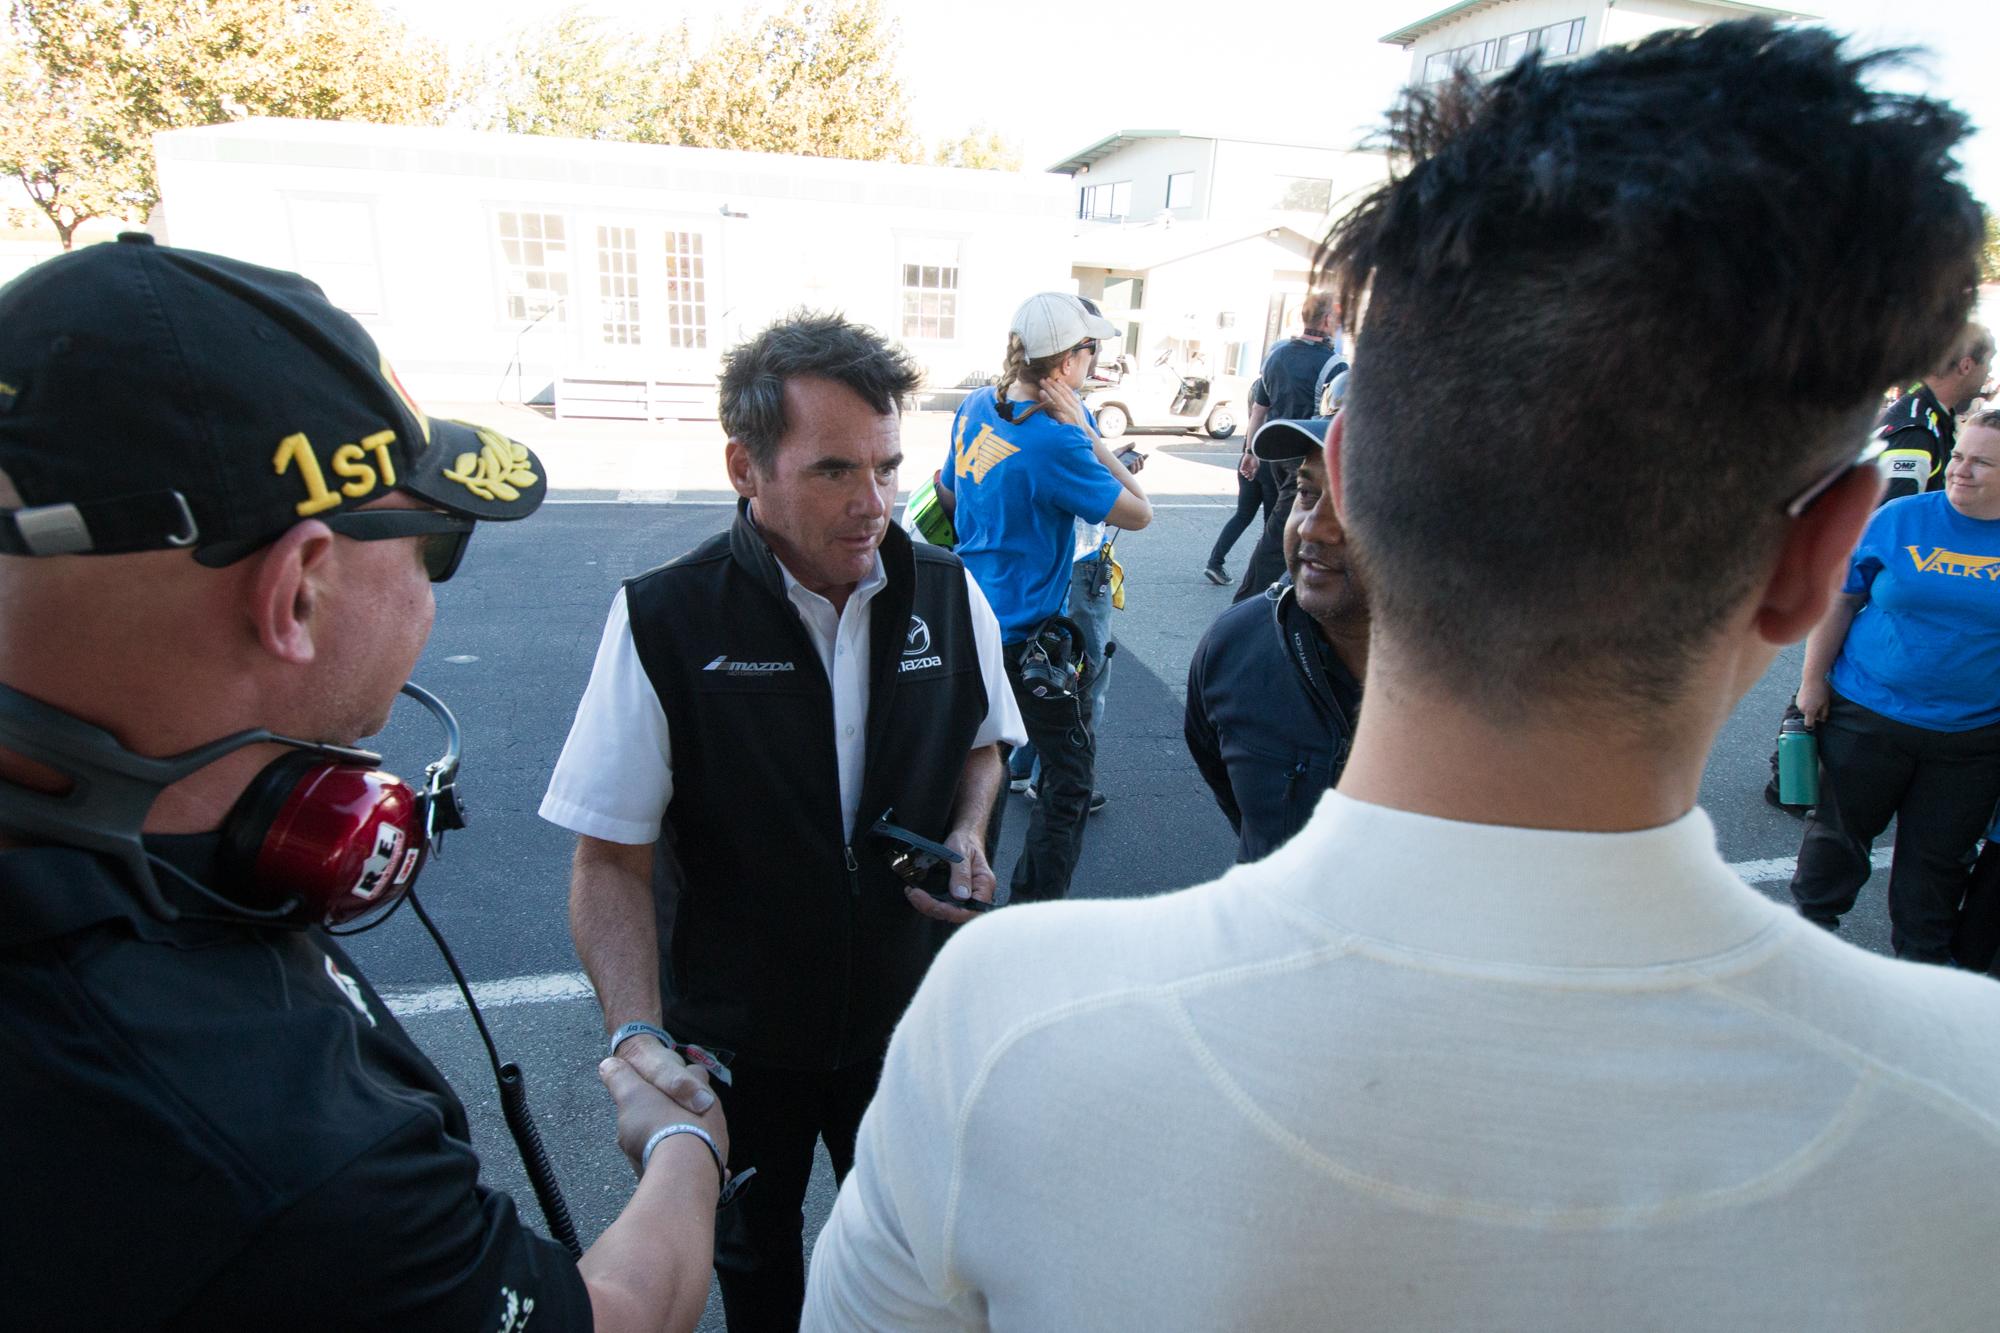 Steven-Racing-20130208-45879.jpg